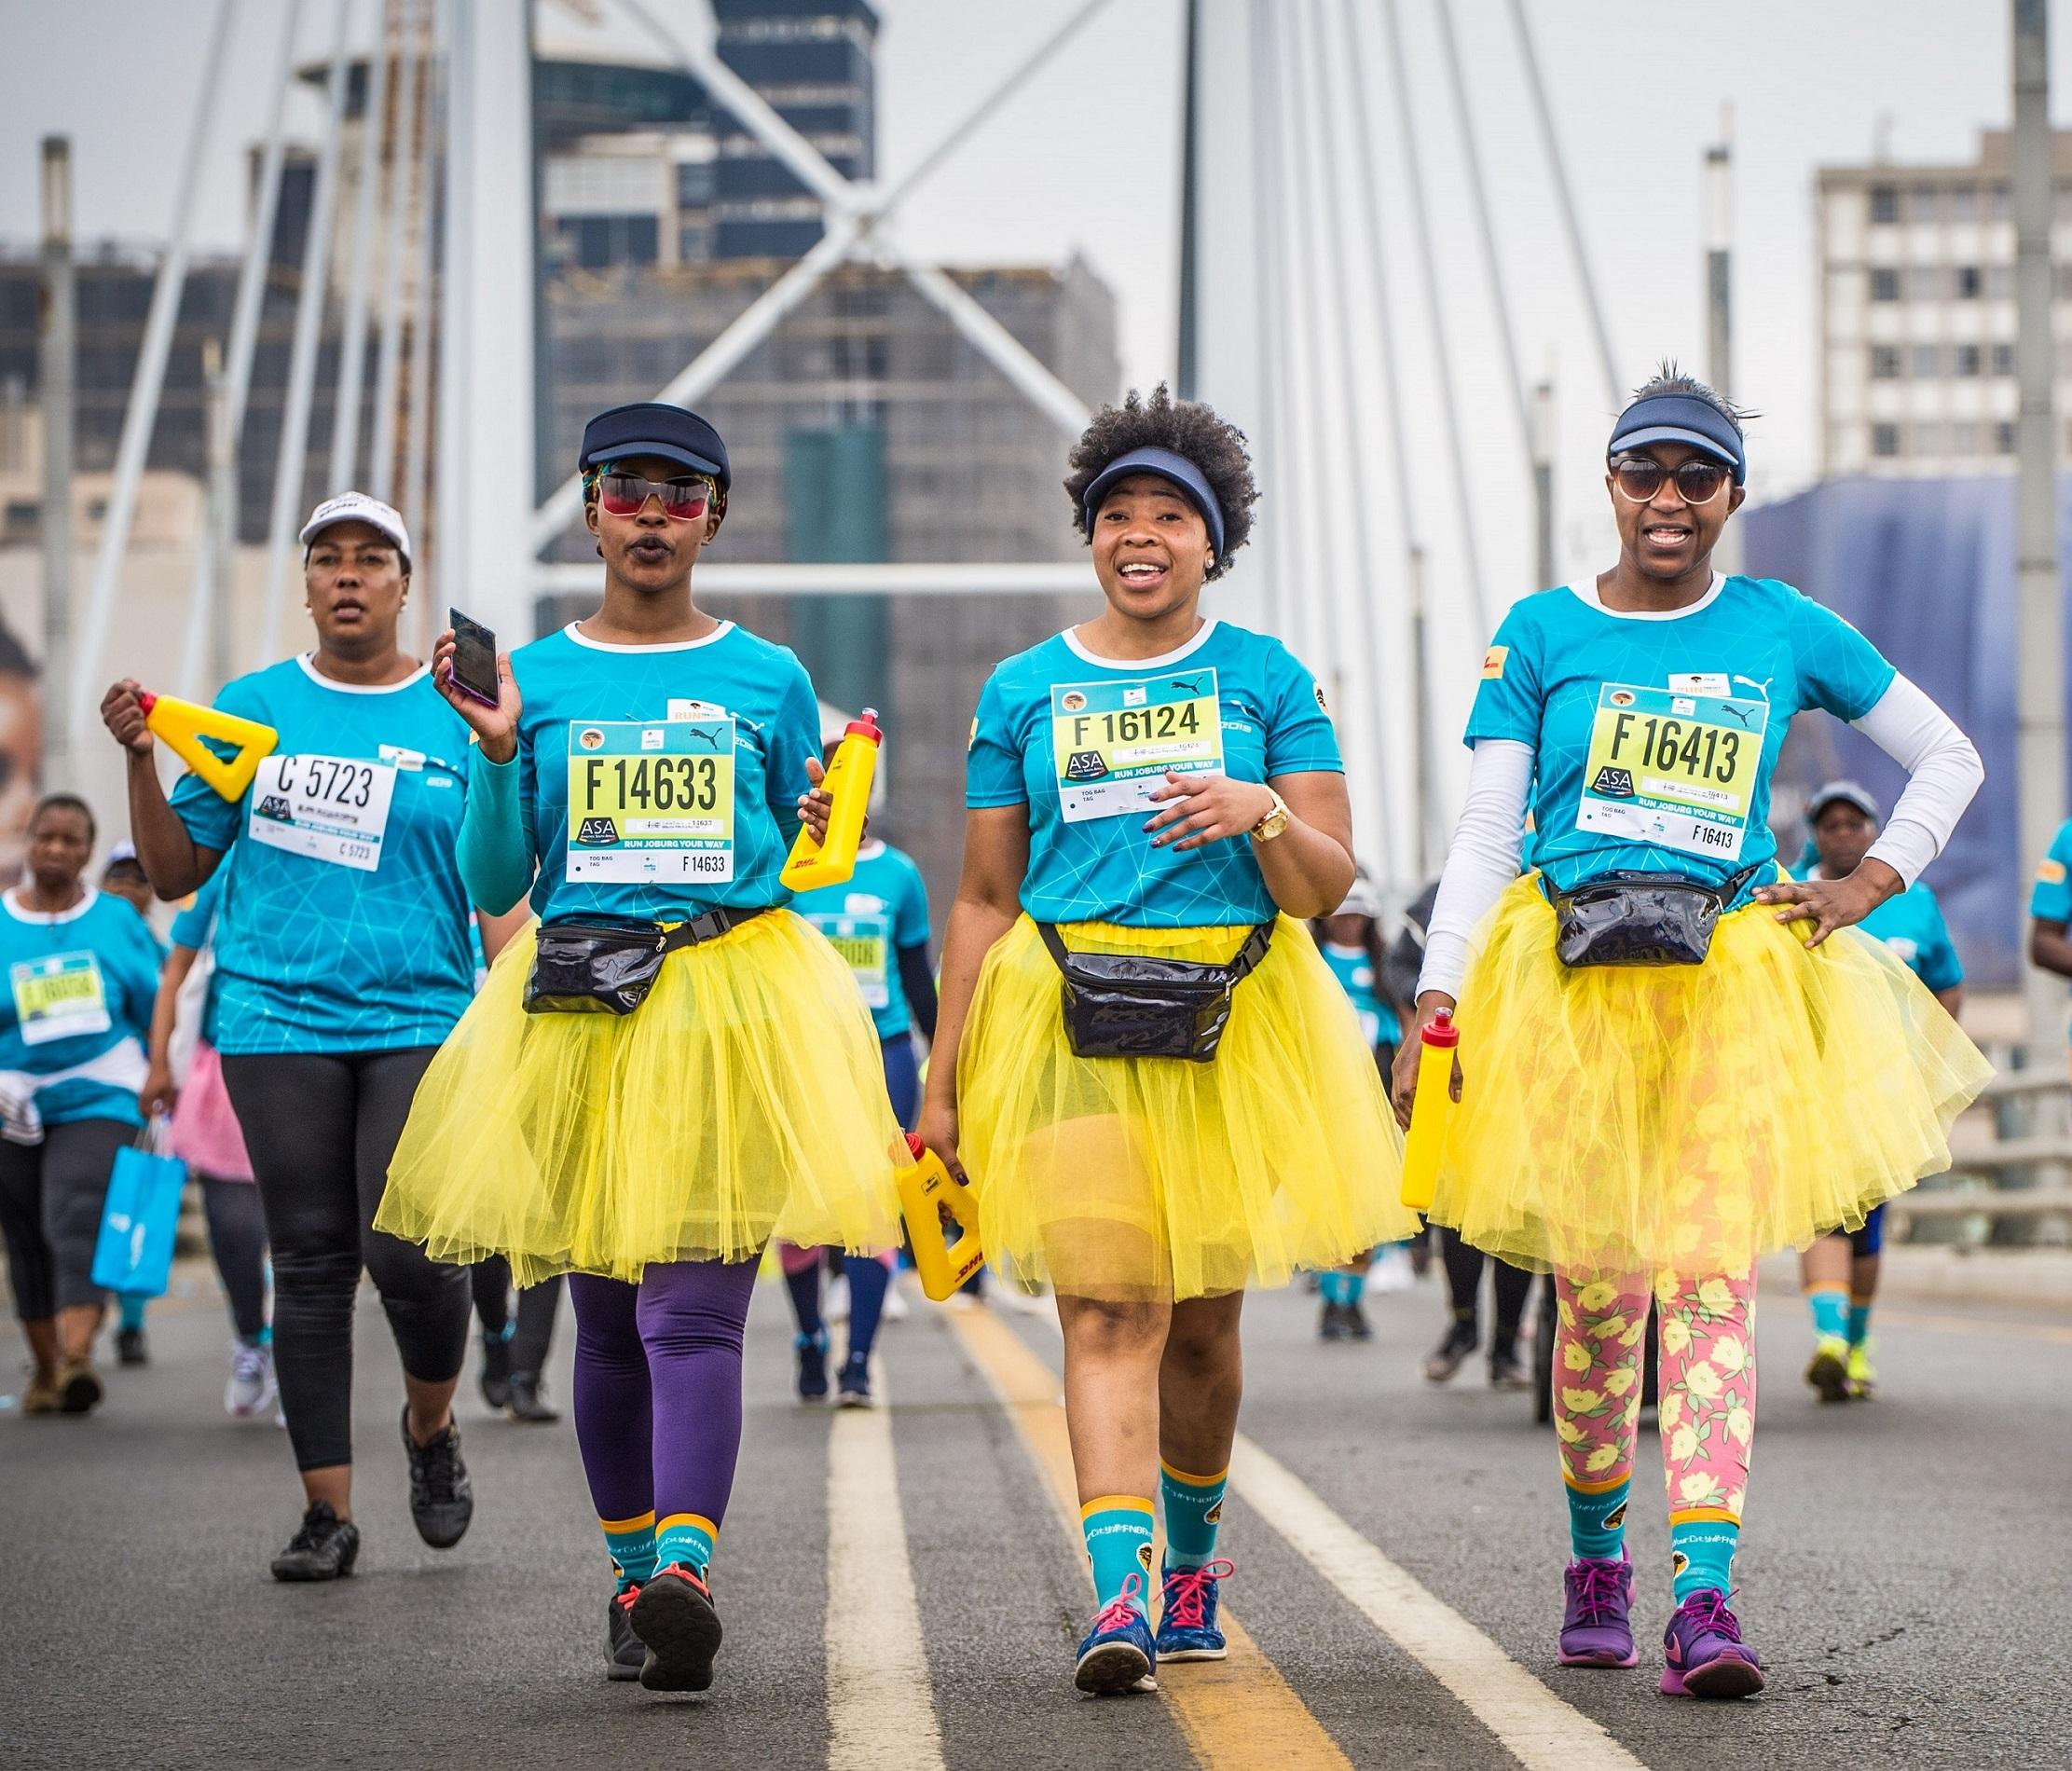 Runners in action during the 2019 FNB Joburg 10K CITYRUN.  Photo Credit:  Tobias Ginsberg